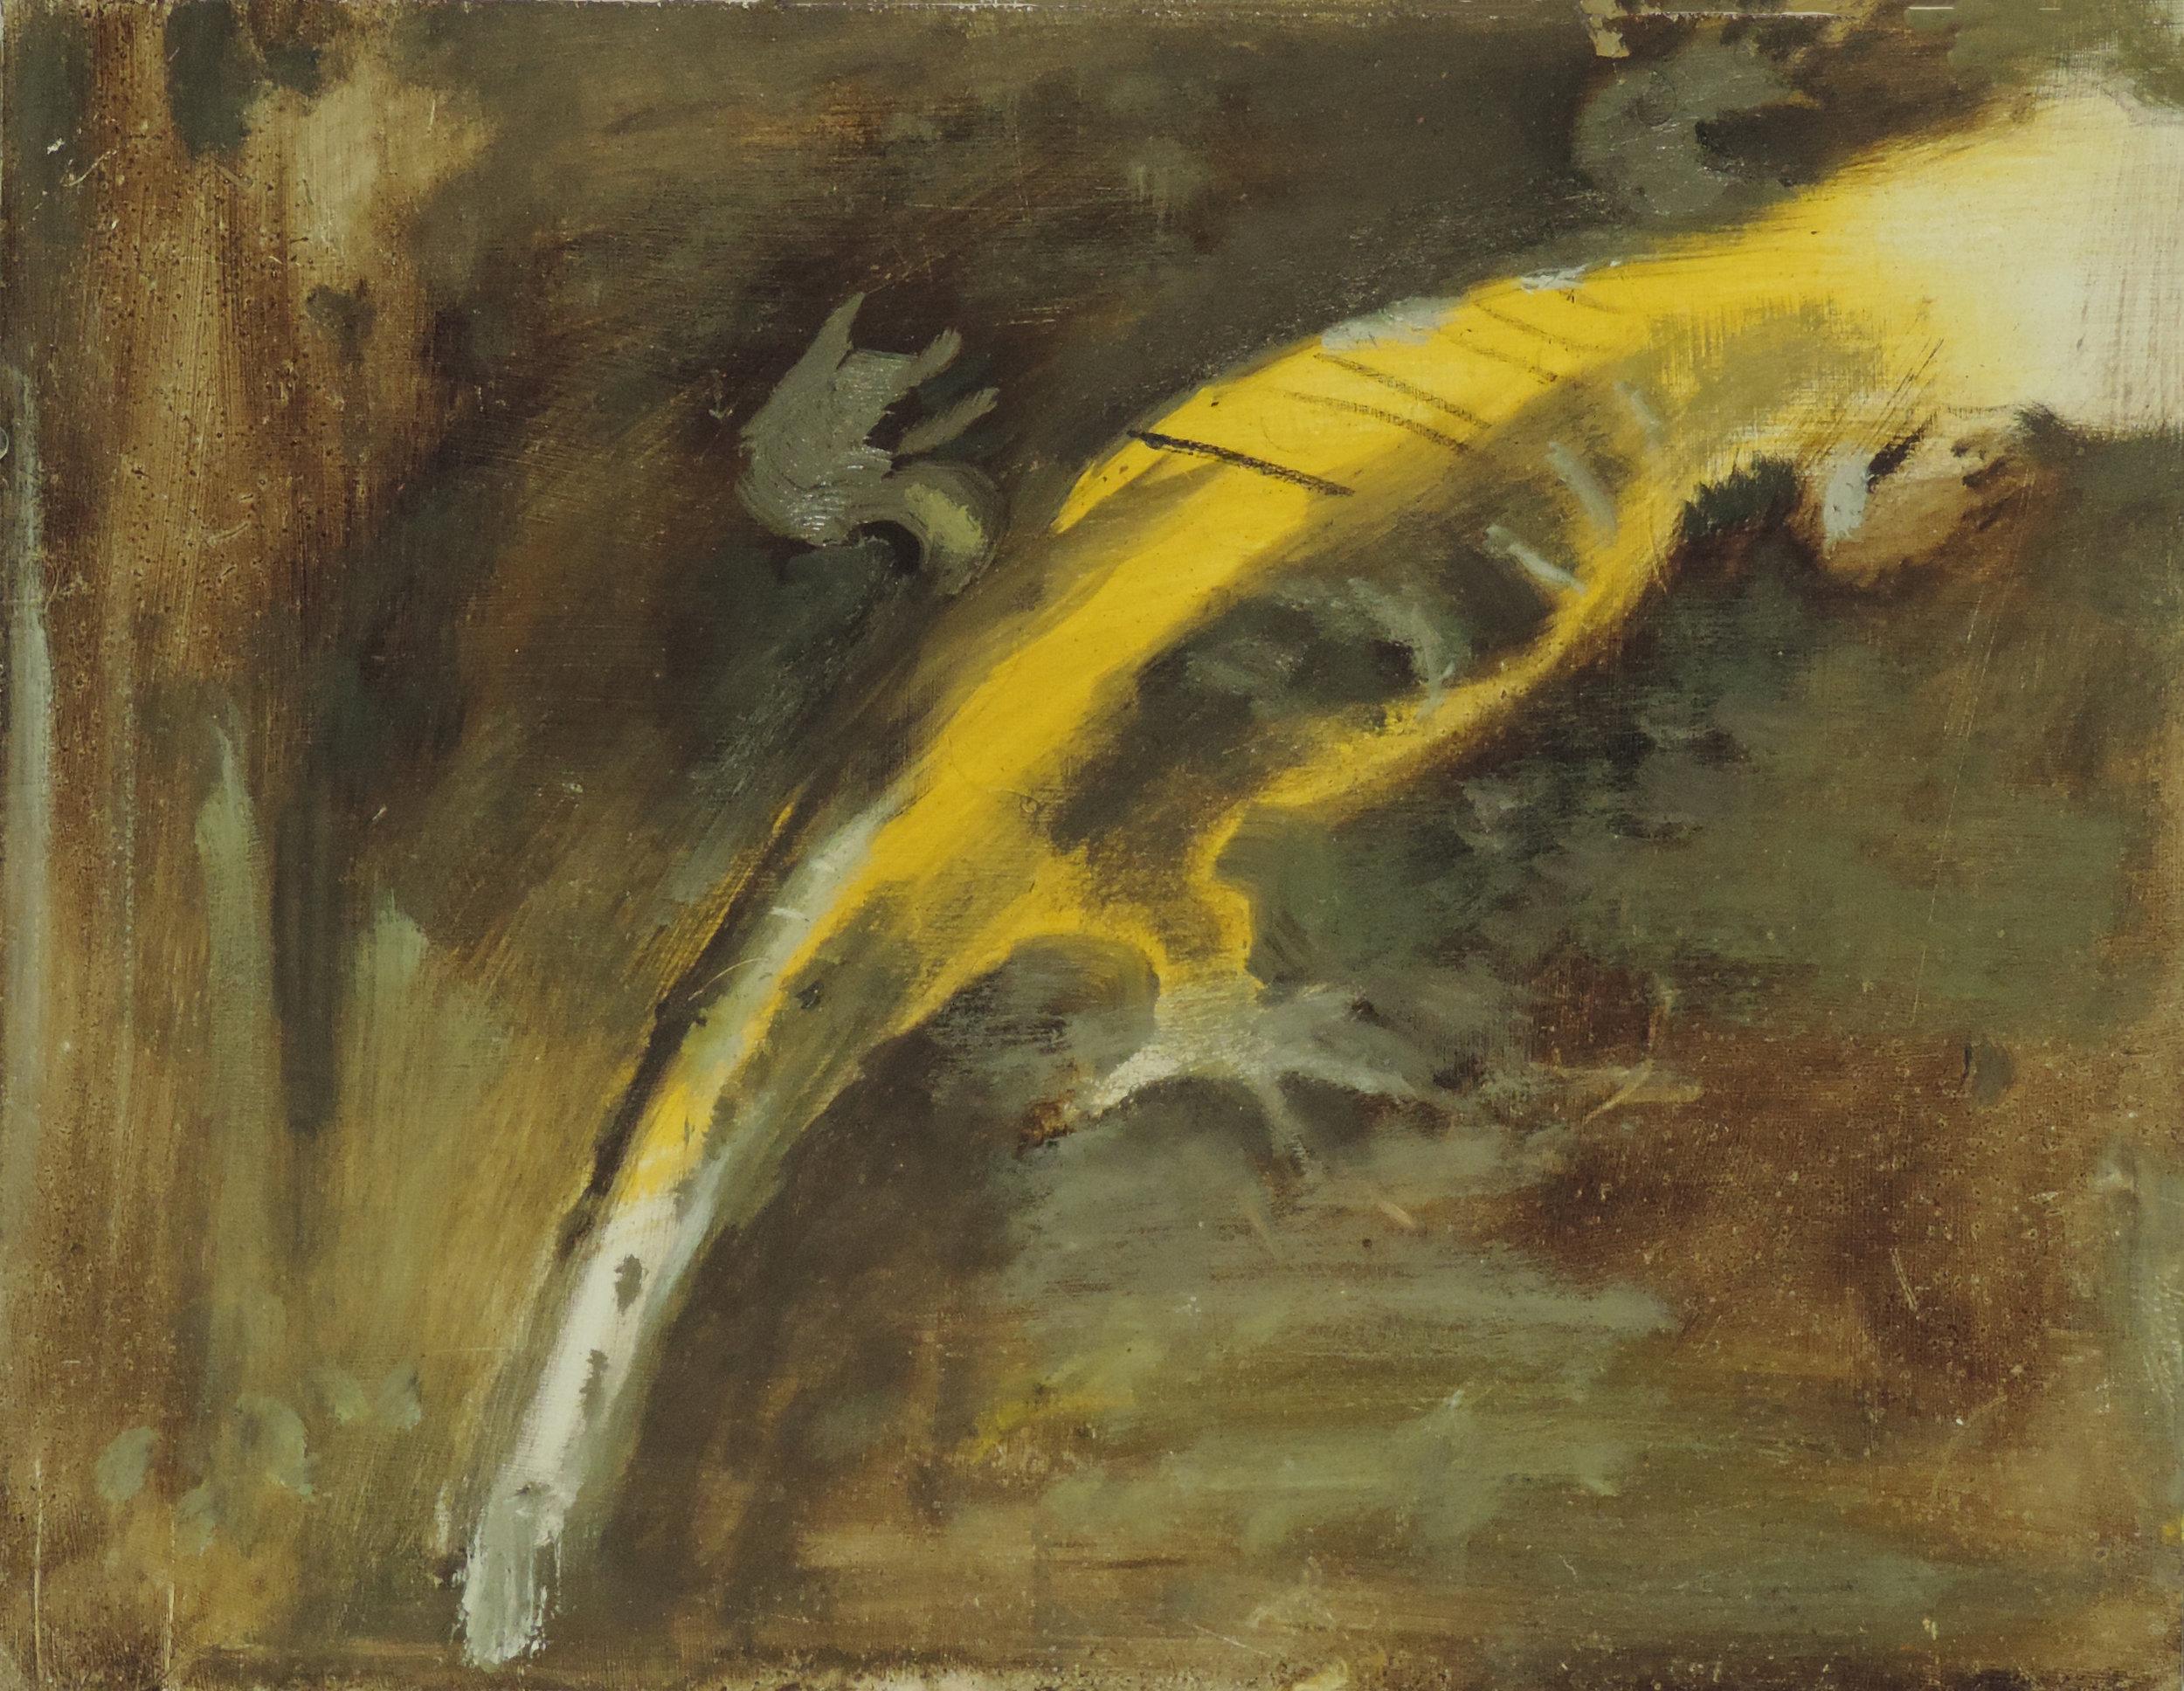 Longtoed Salamander